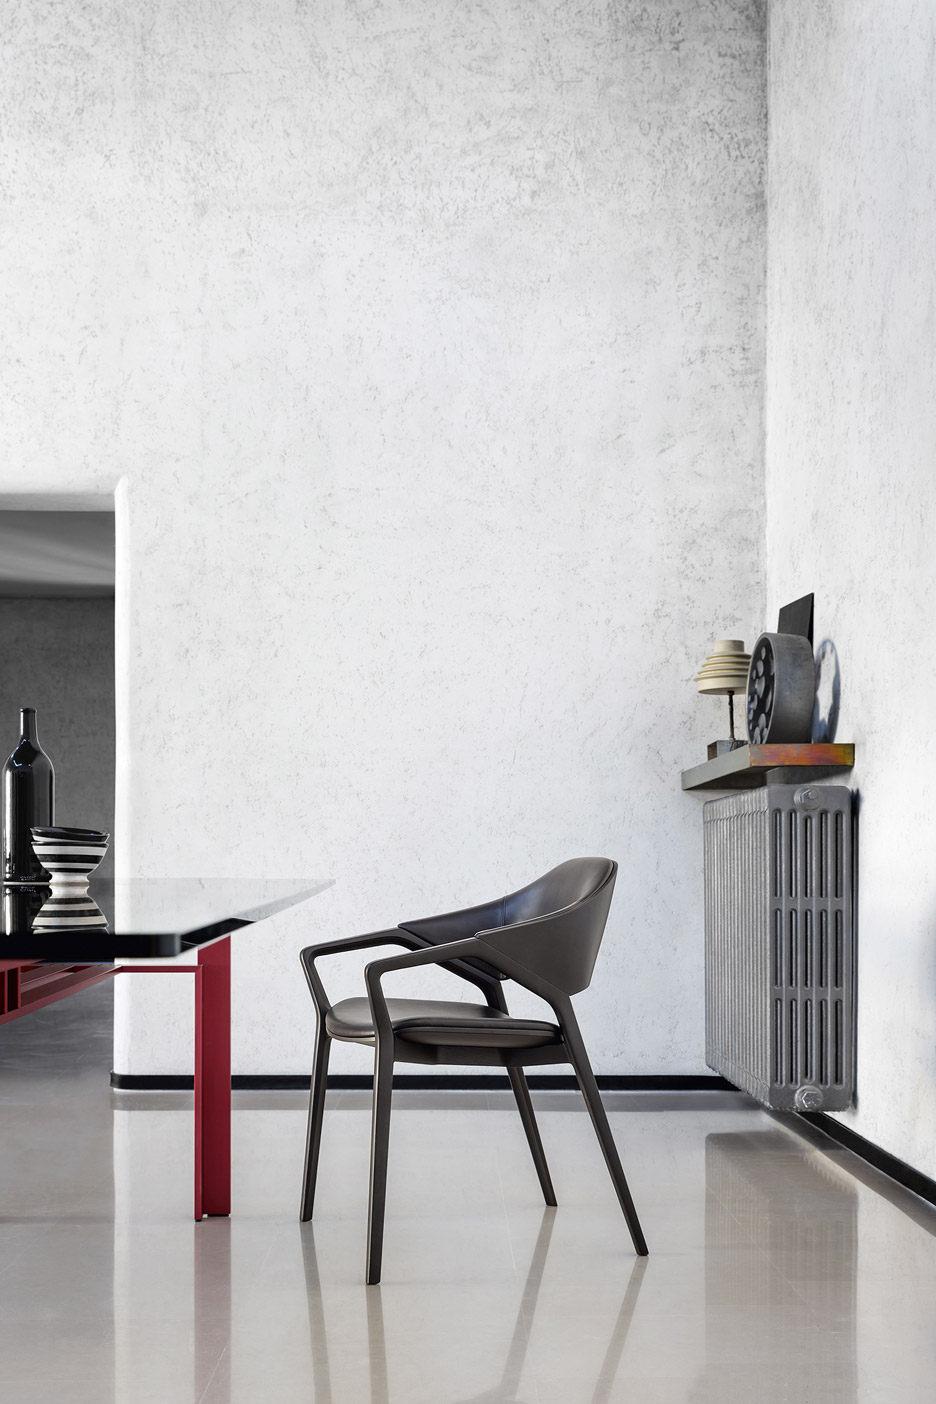 origins-of-the-future-collection-cassina-patricia-urquiola-milan-design-week_rushi_sq.jpg